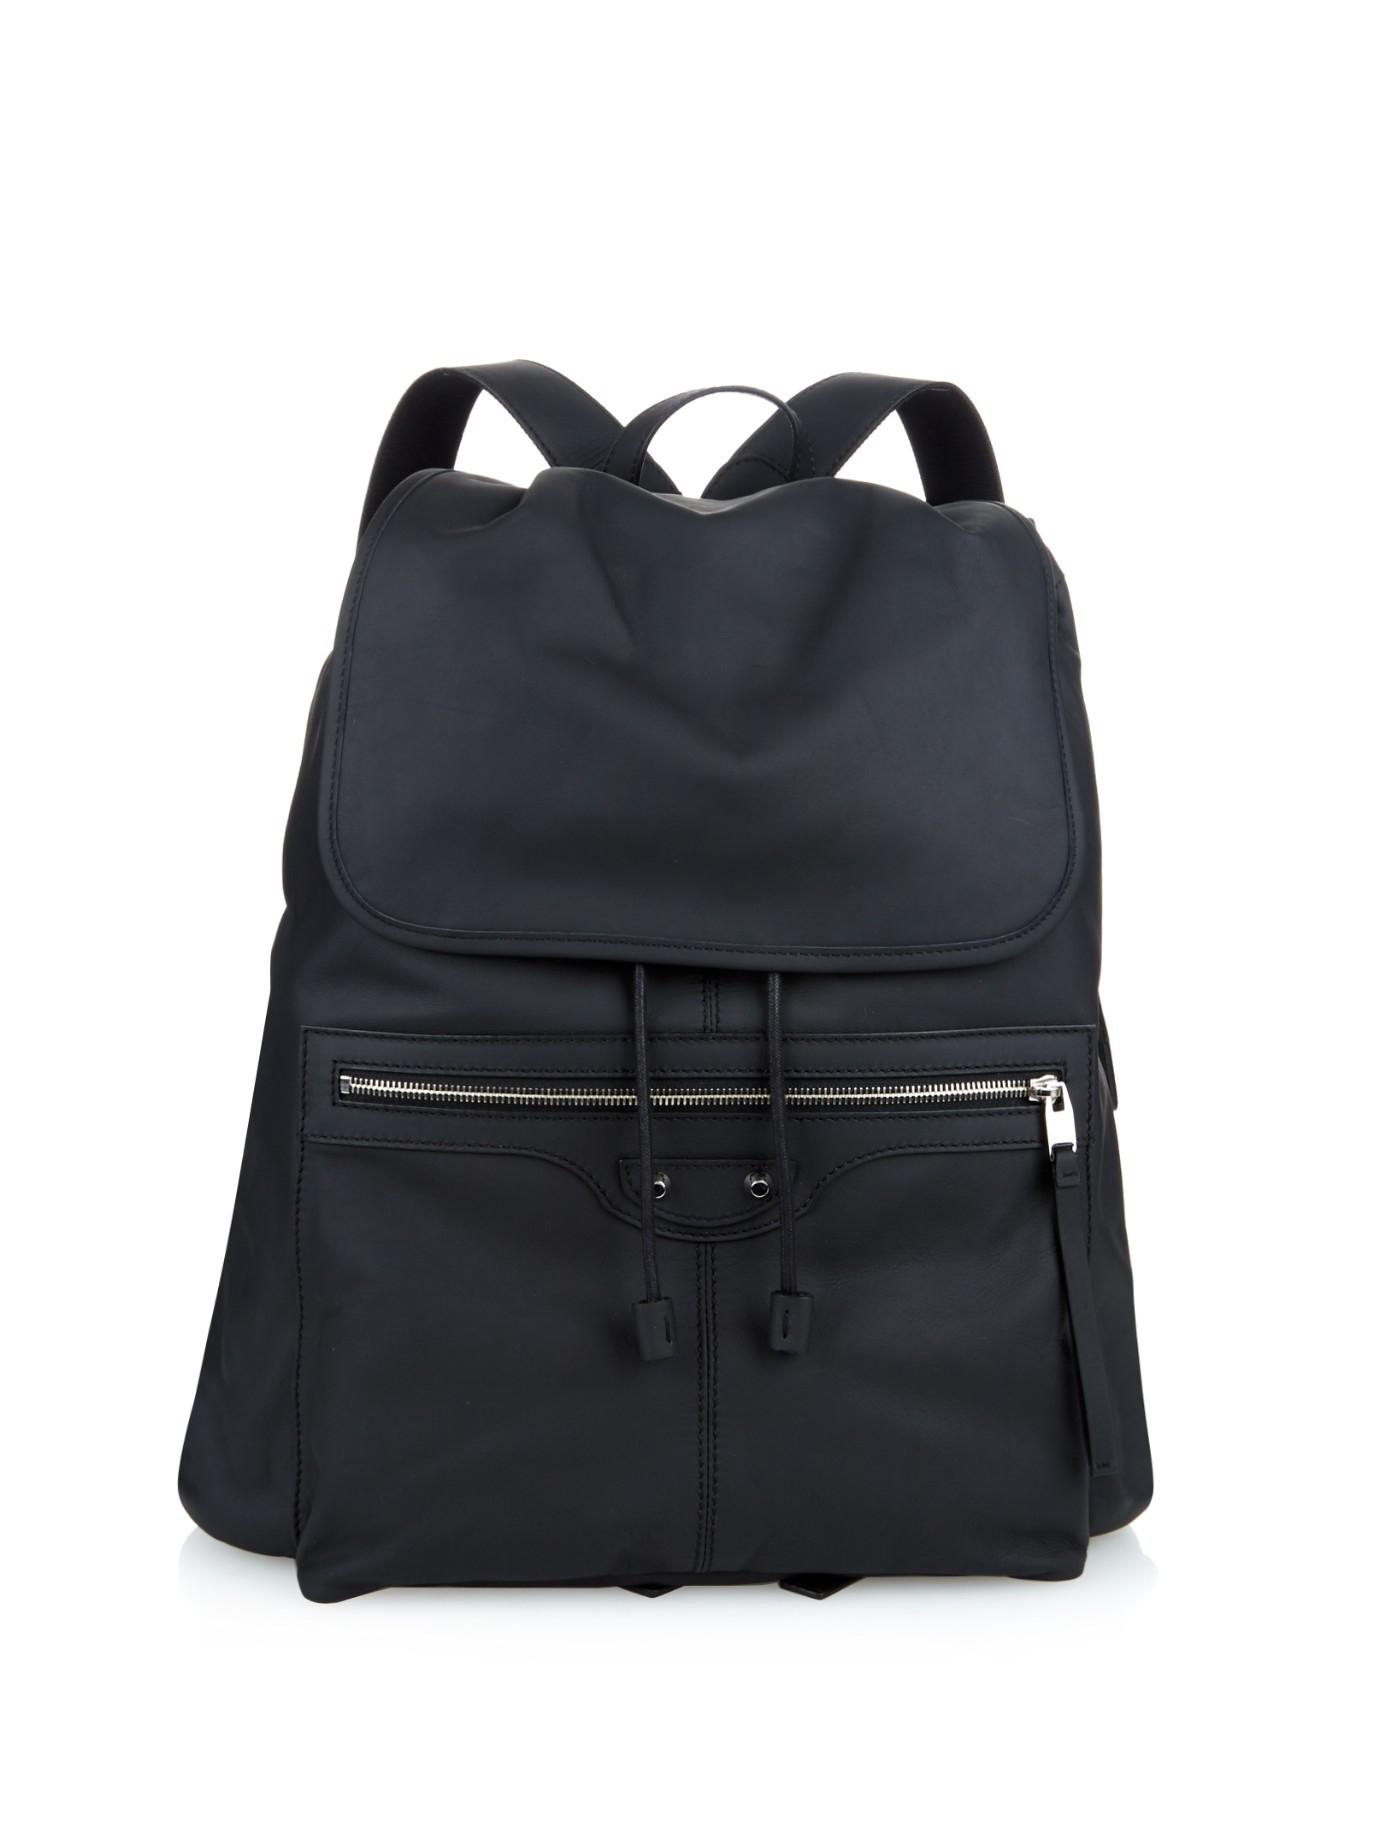 Balenciaga Backpack Nylon